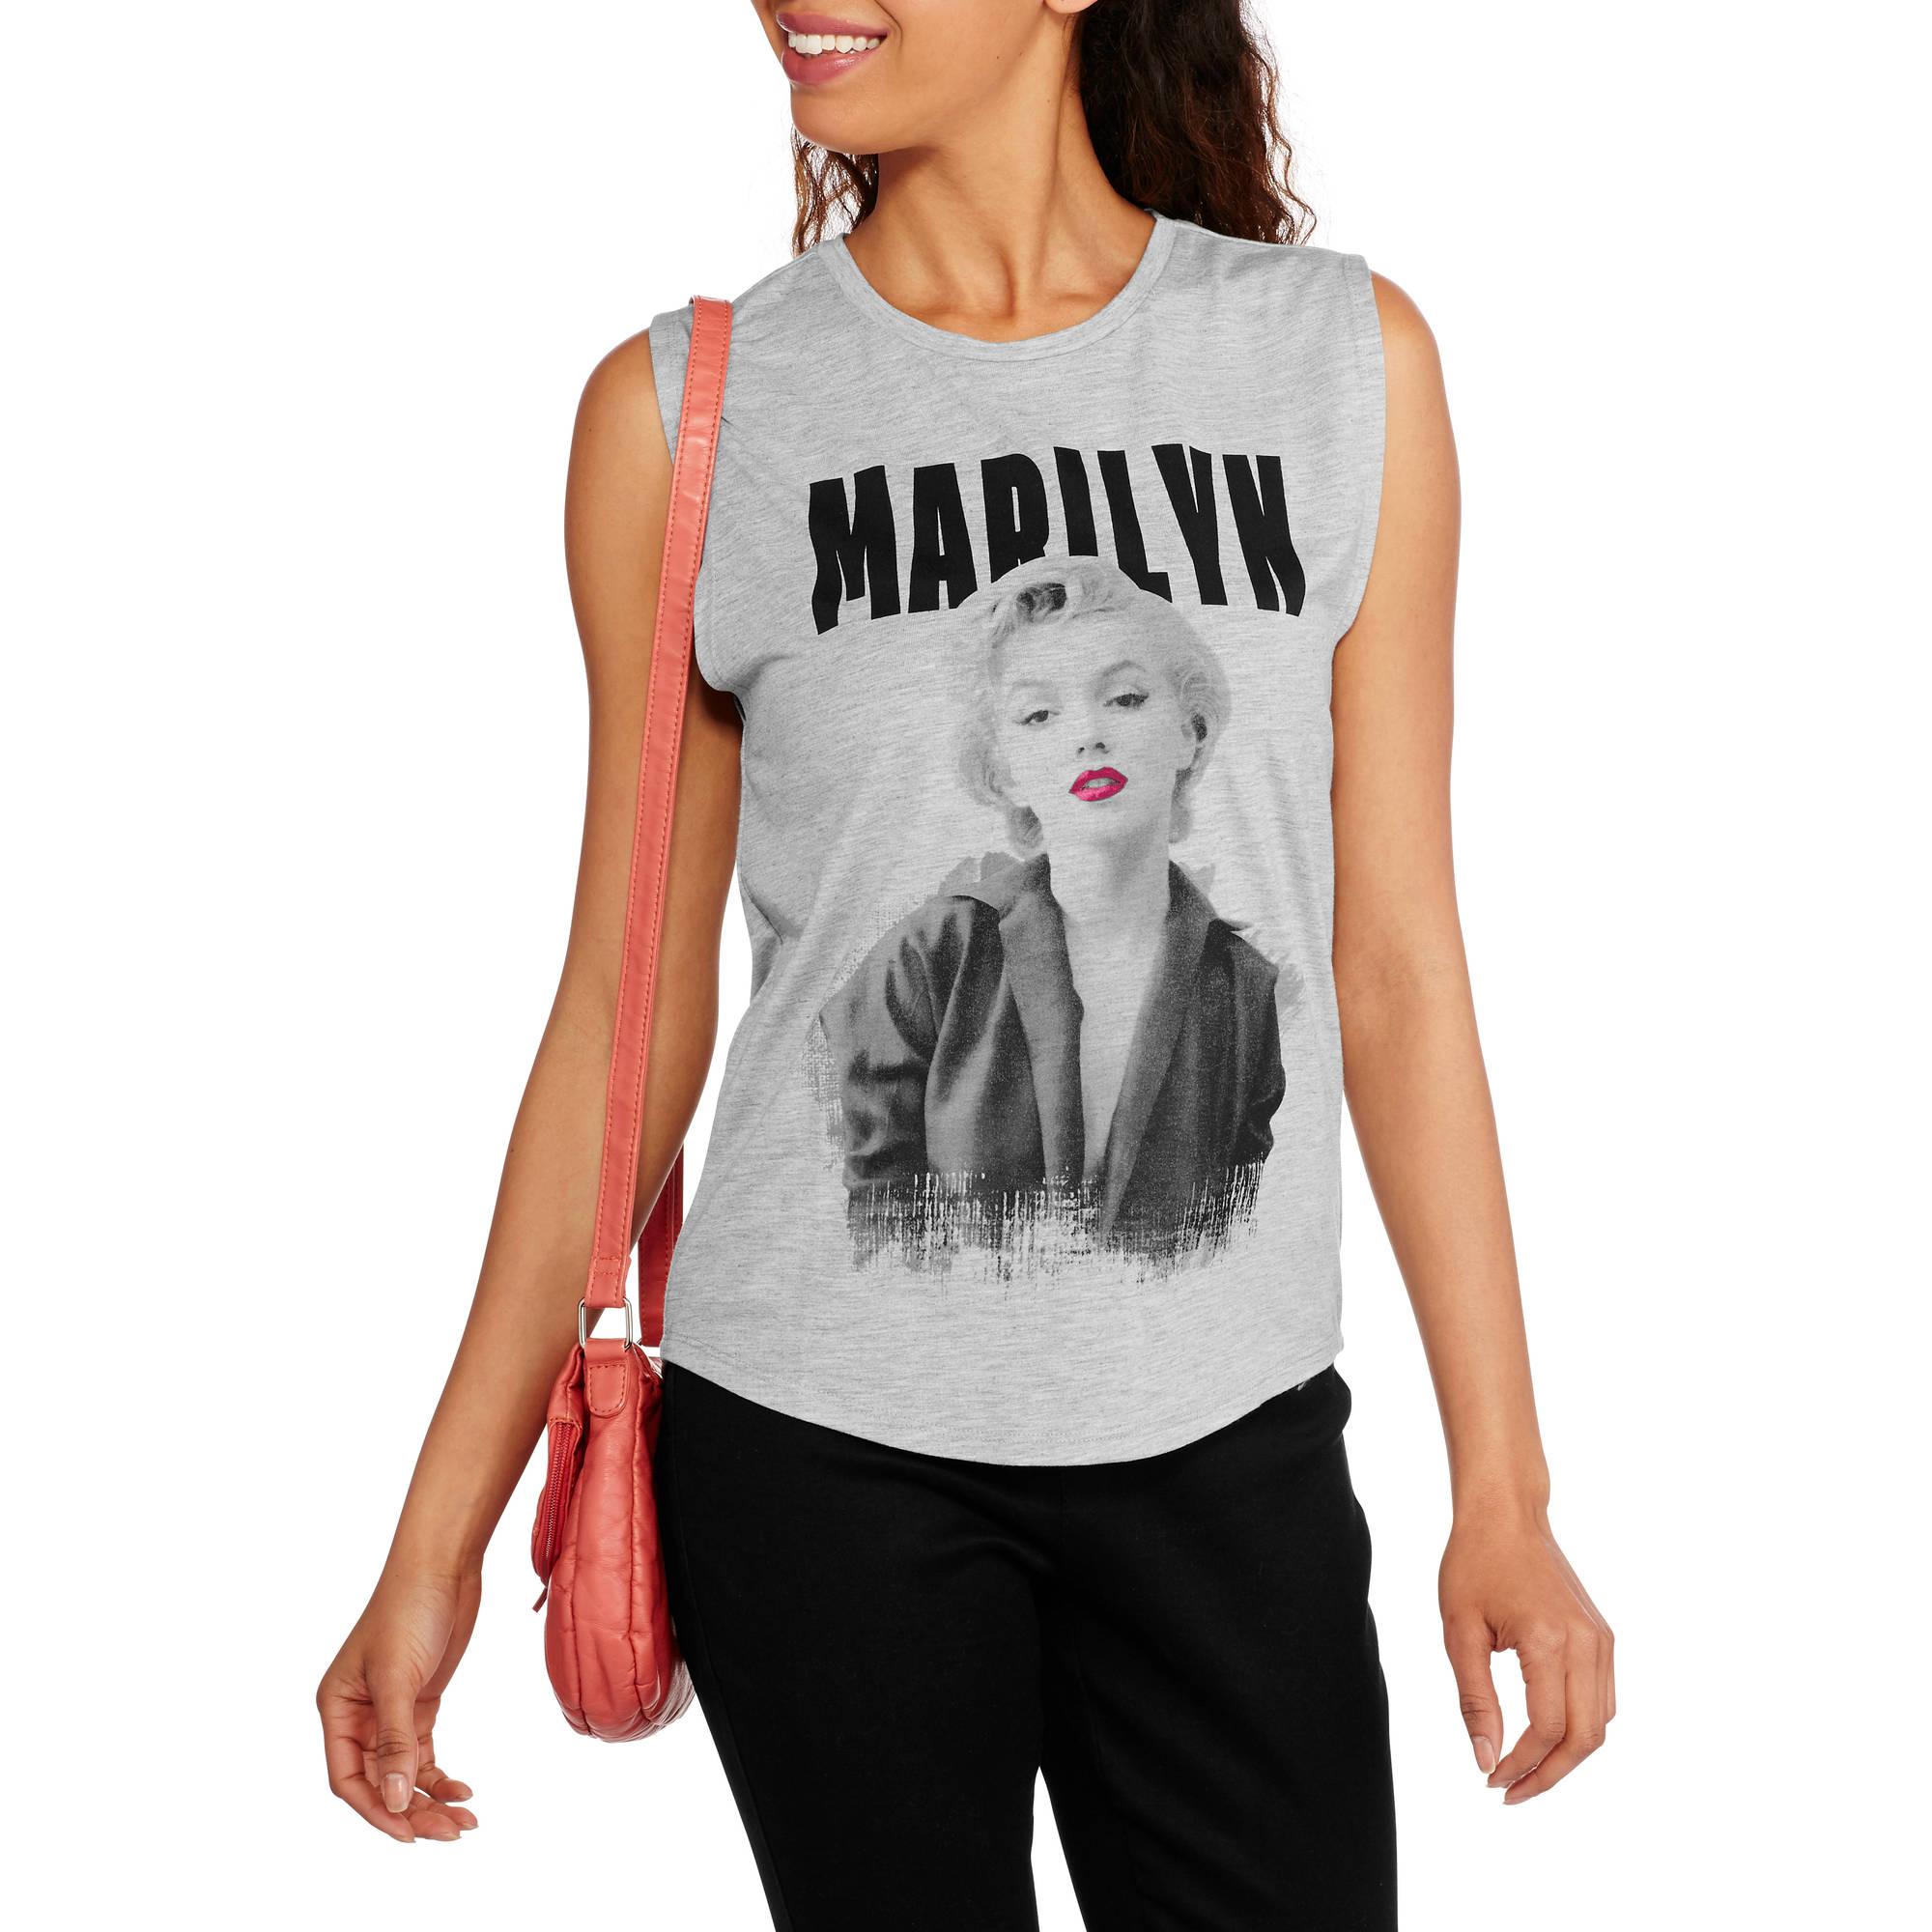 Marilyn Monroe Juniors' Graphic Shirttail Muscle Tank